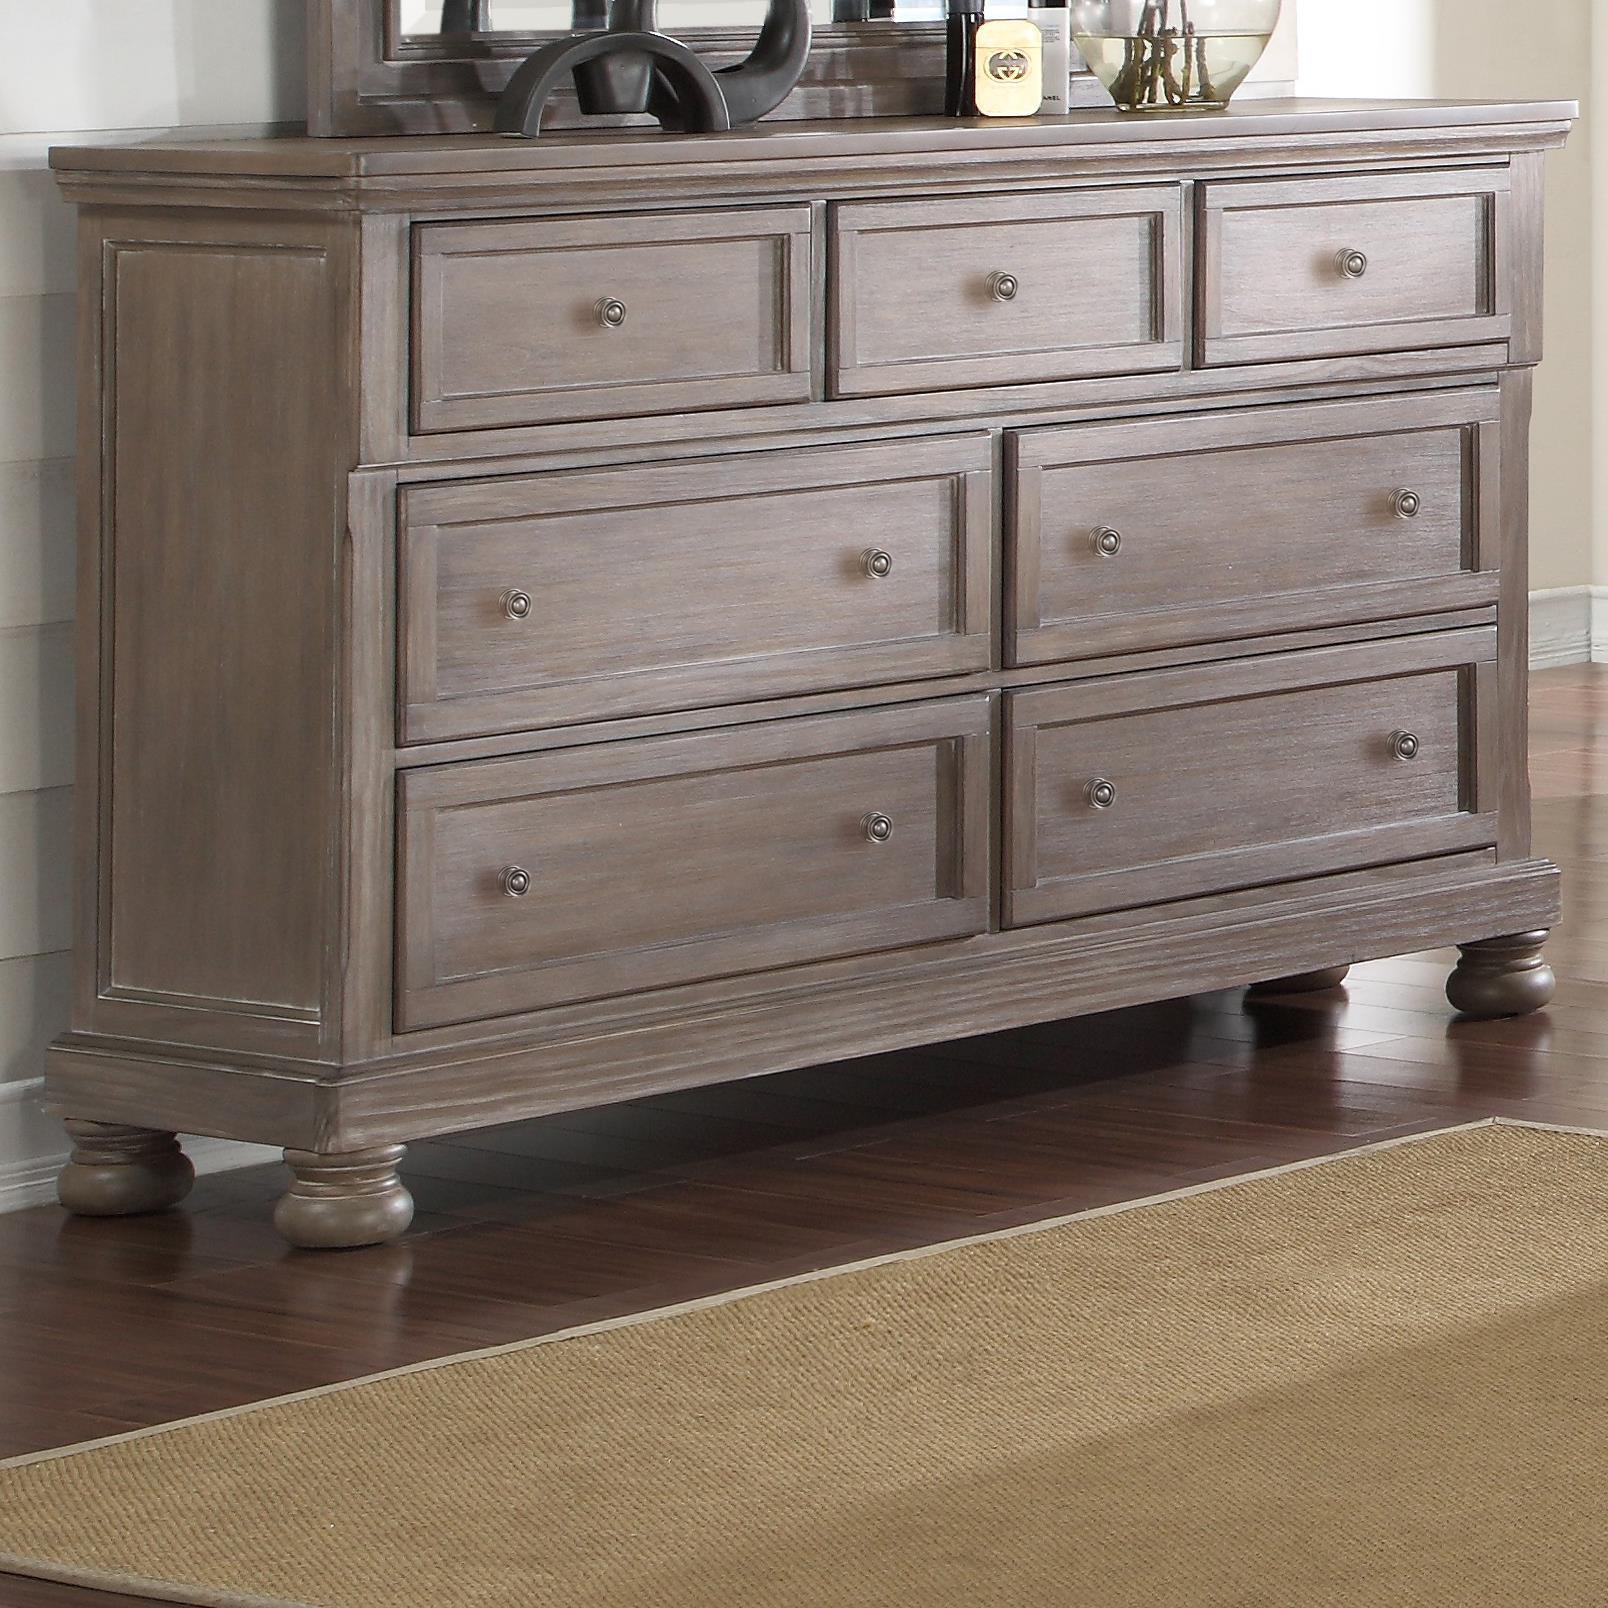 Allegra Dresser by New Classic at Wilcox Furniture